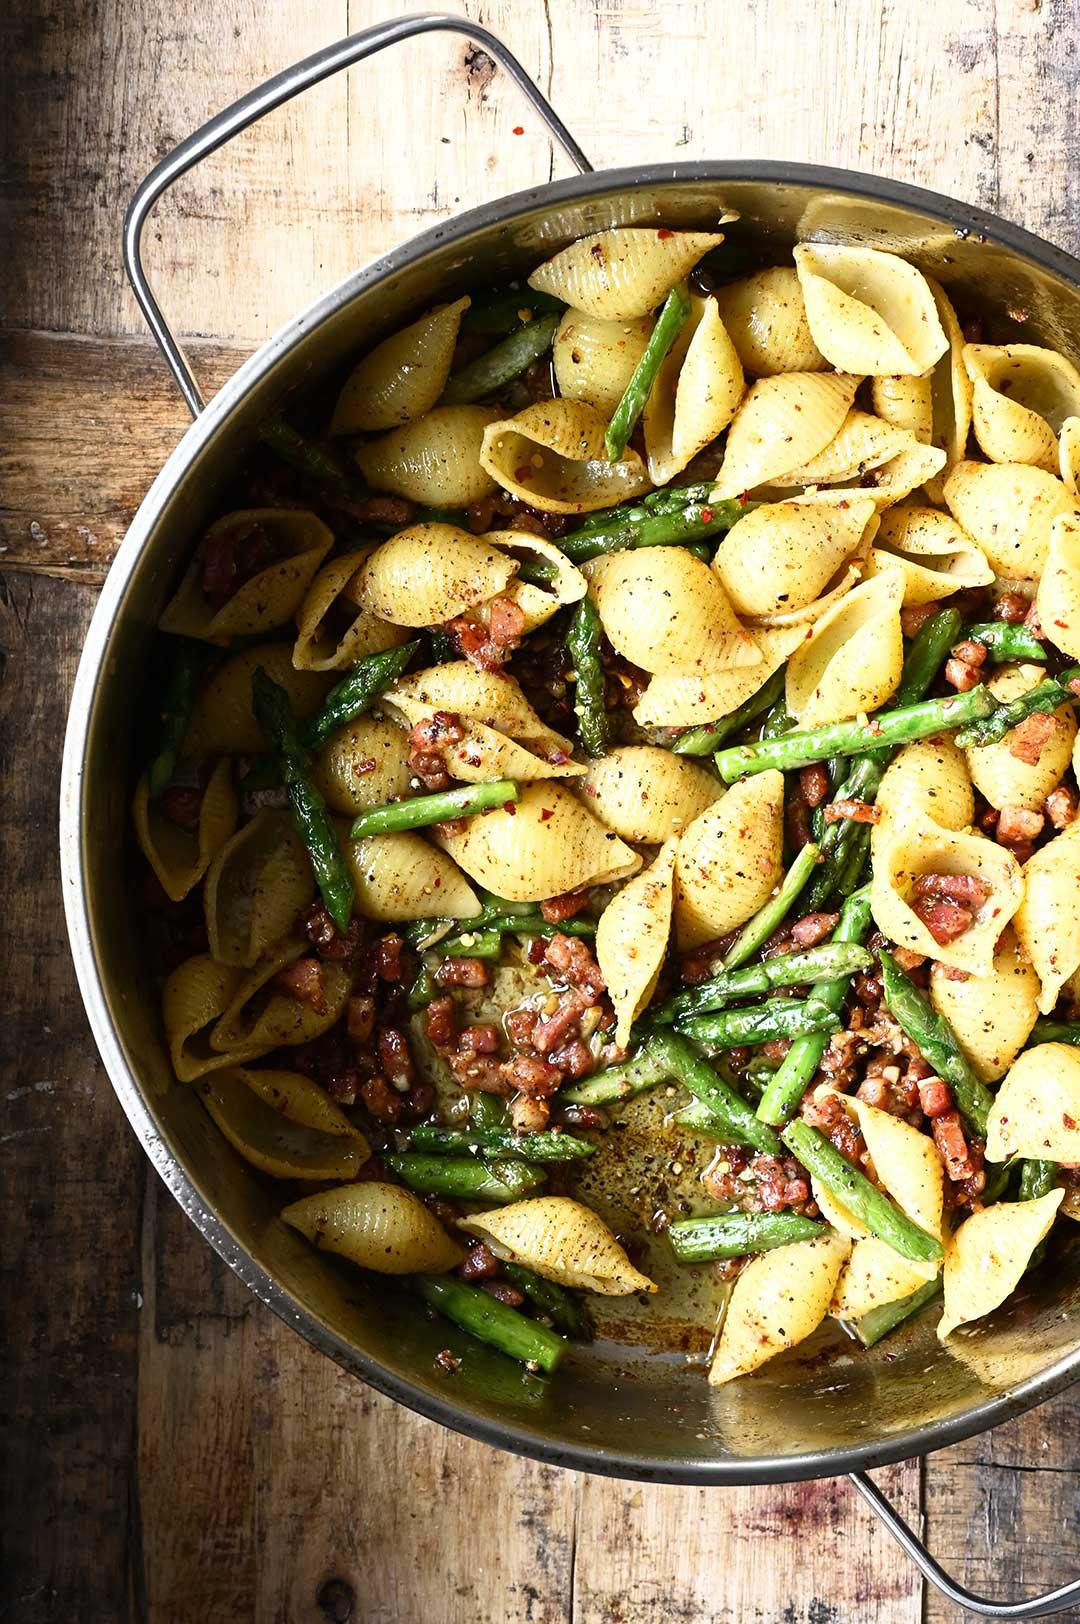 serving dumplings | Pasta met asperges, spek en beurre noisette